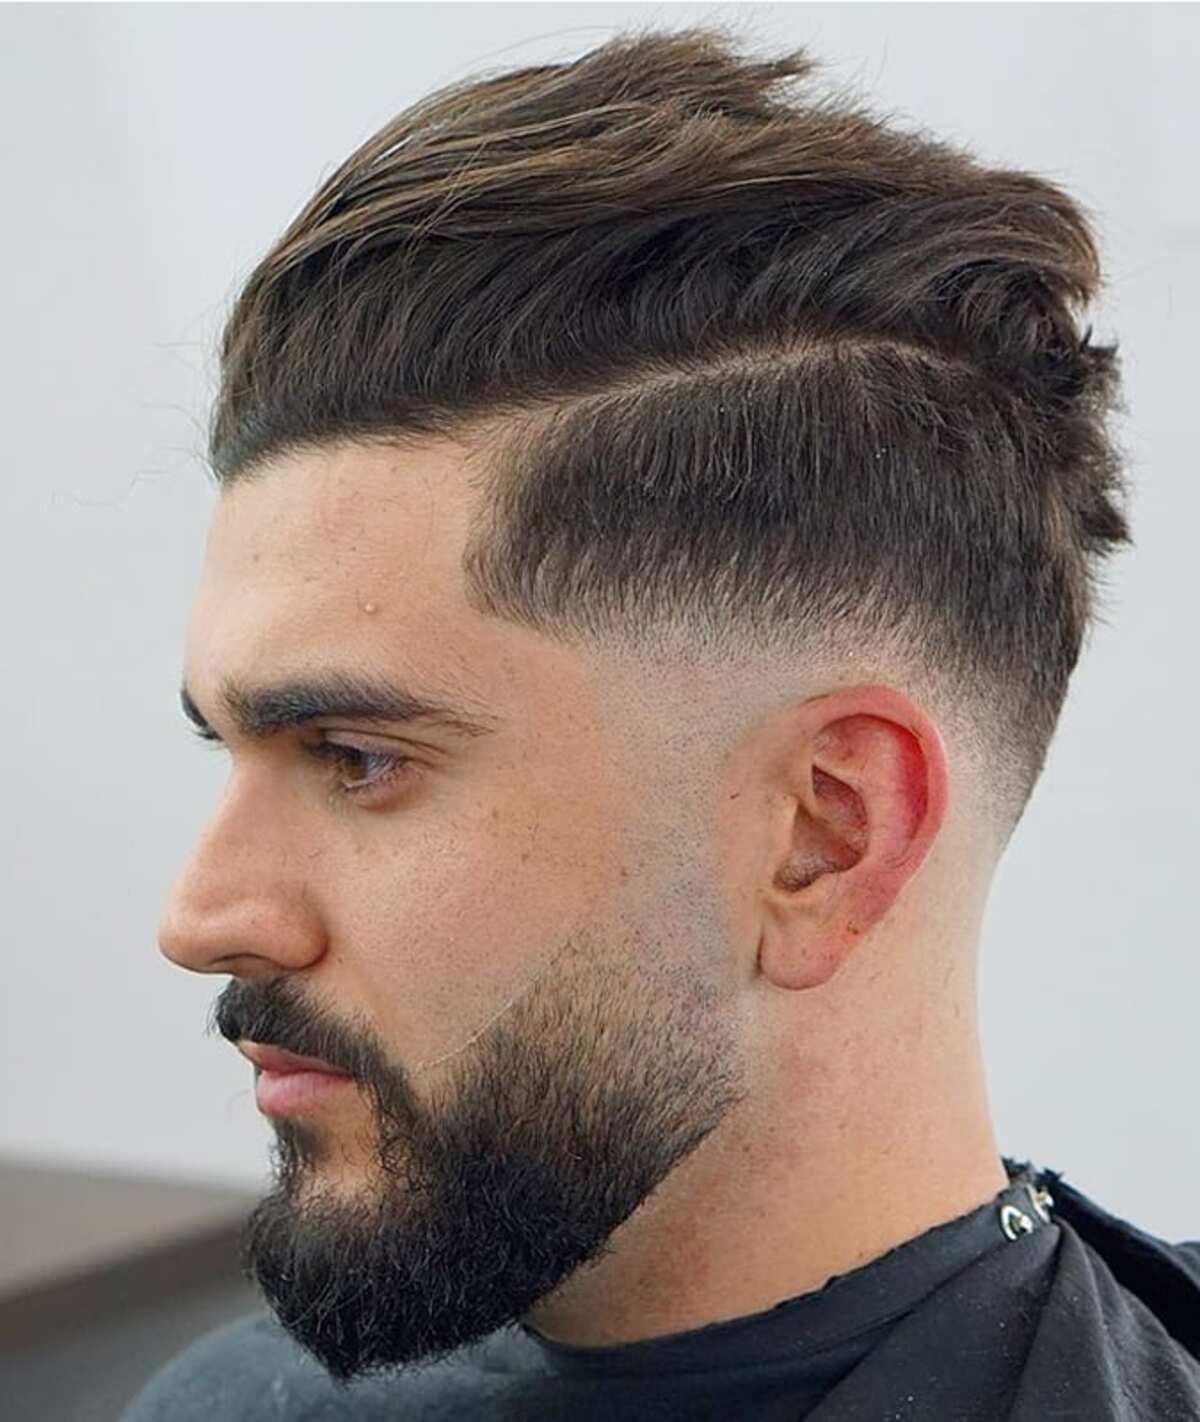 Corte de pelo medio con barba.